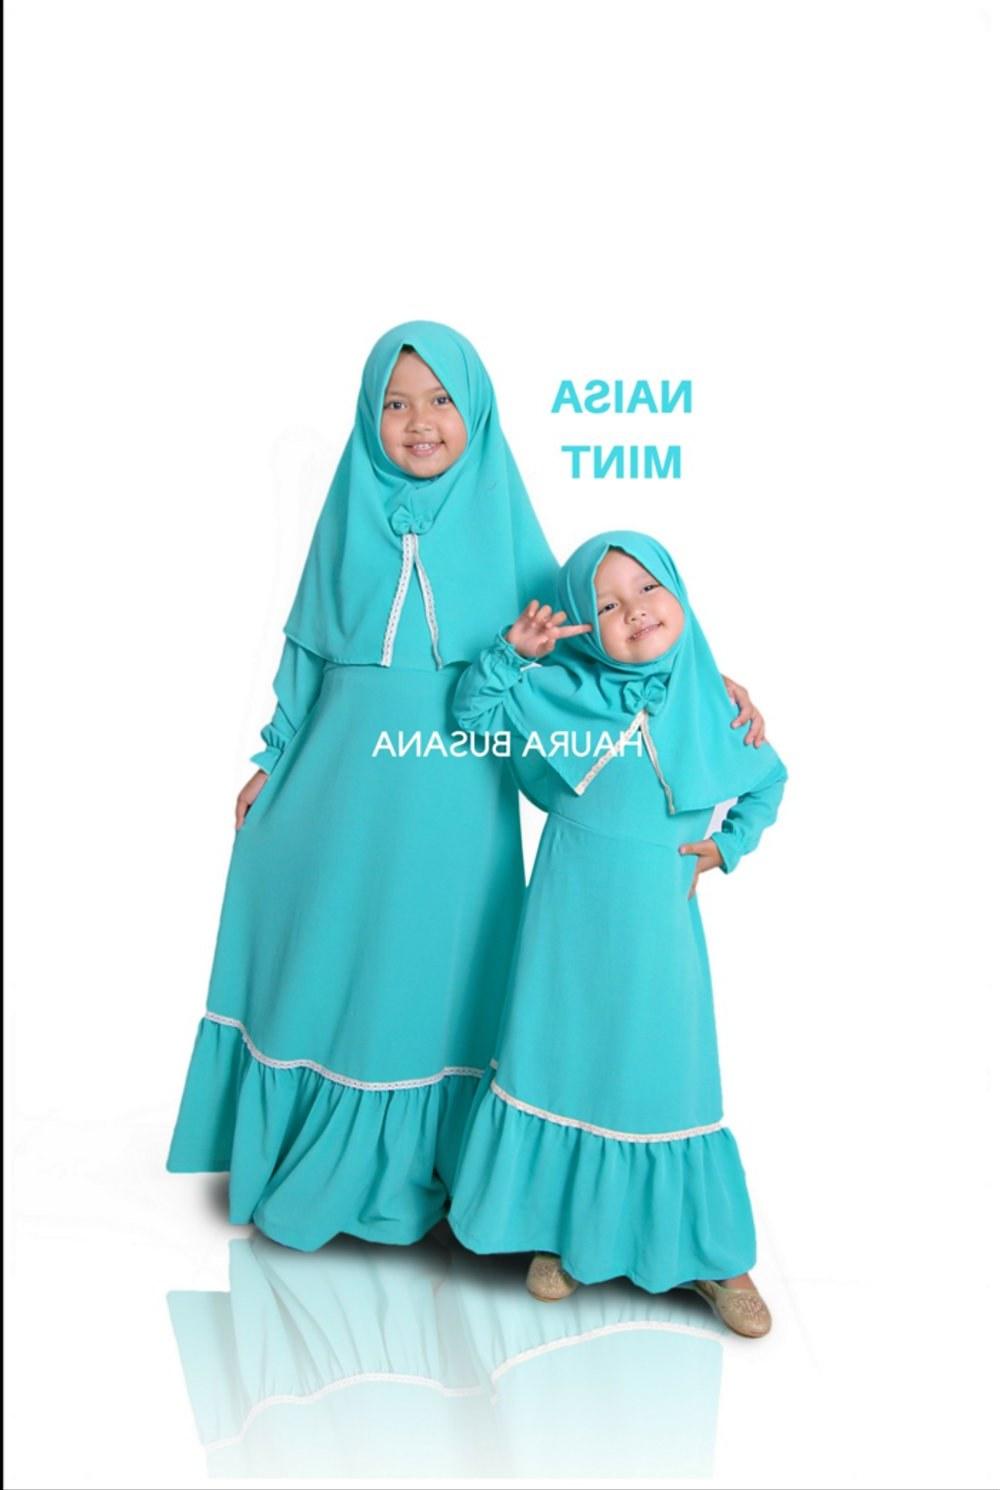 Bentuk Baju Pengantin Wanita Muslimah 8ydm Bayi